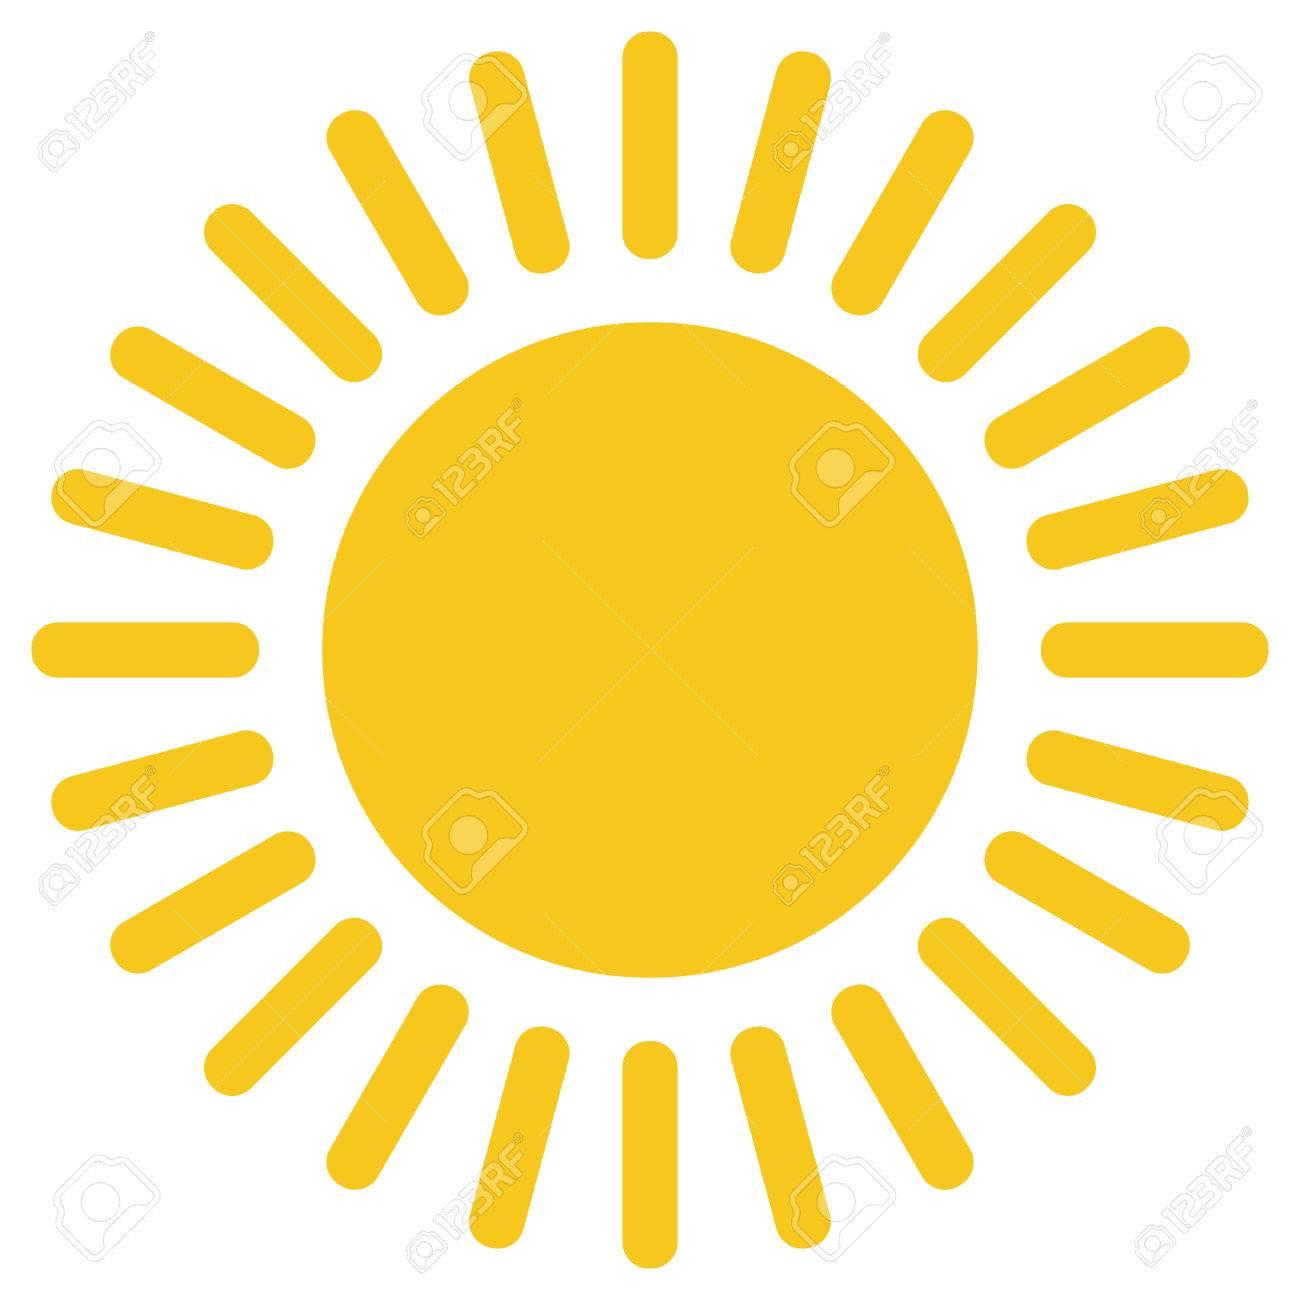 yellow gold sun icon isolated on background modern flat pictogram rh 123rf com Free Vector Textures Free Cartoon Sun